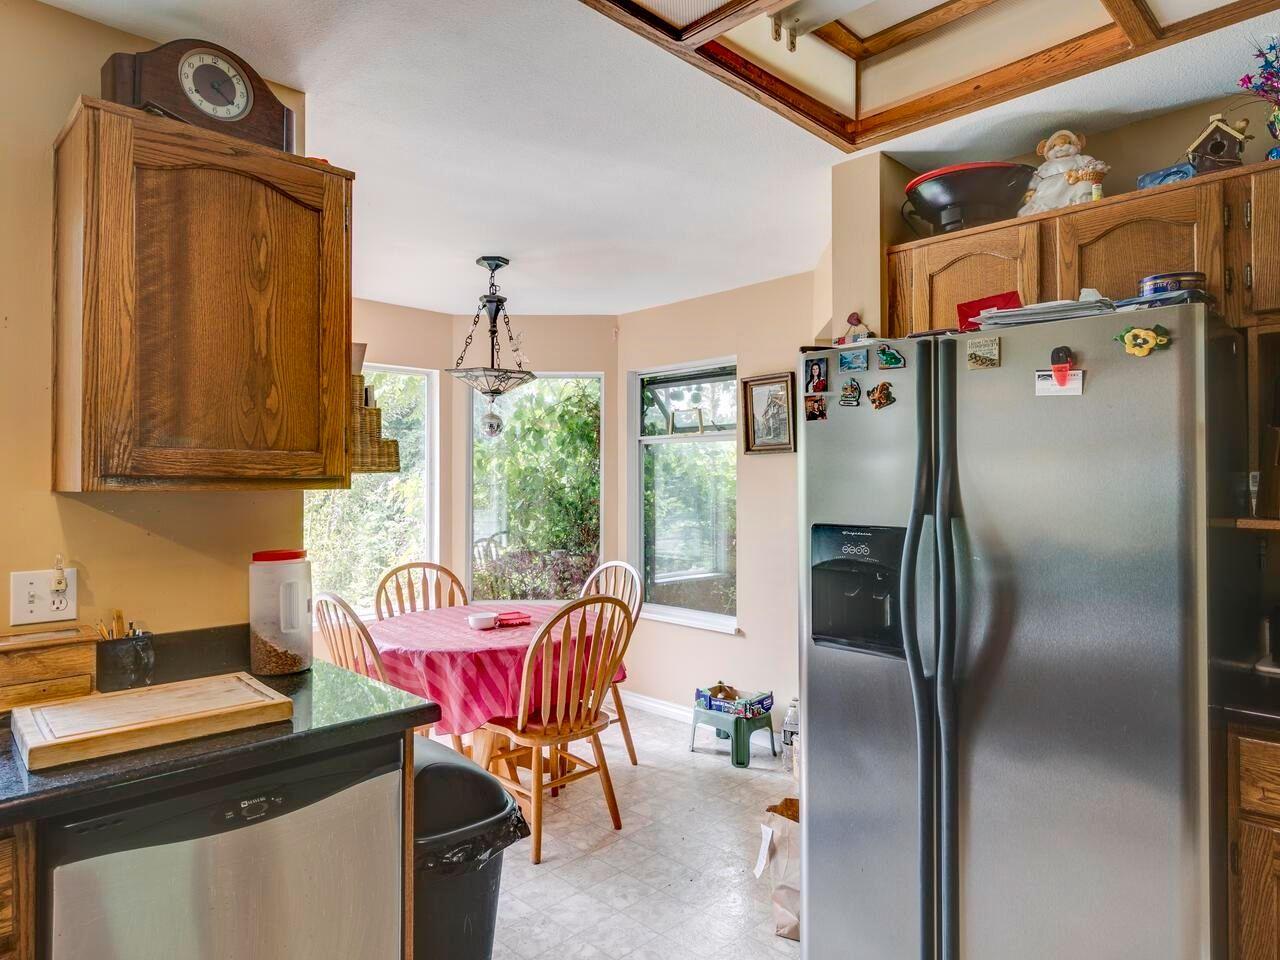 "Photo 9: Photos: 21374 RIVER Road in Maple Ridge: Southwest Maple Ridge House for sale in ""River Road"" : MLS®# R2600142"